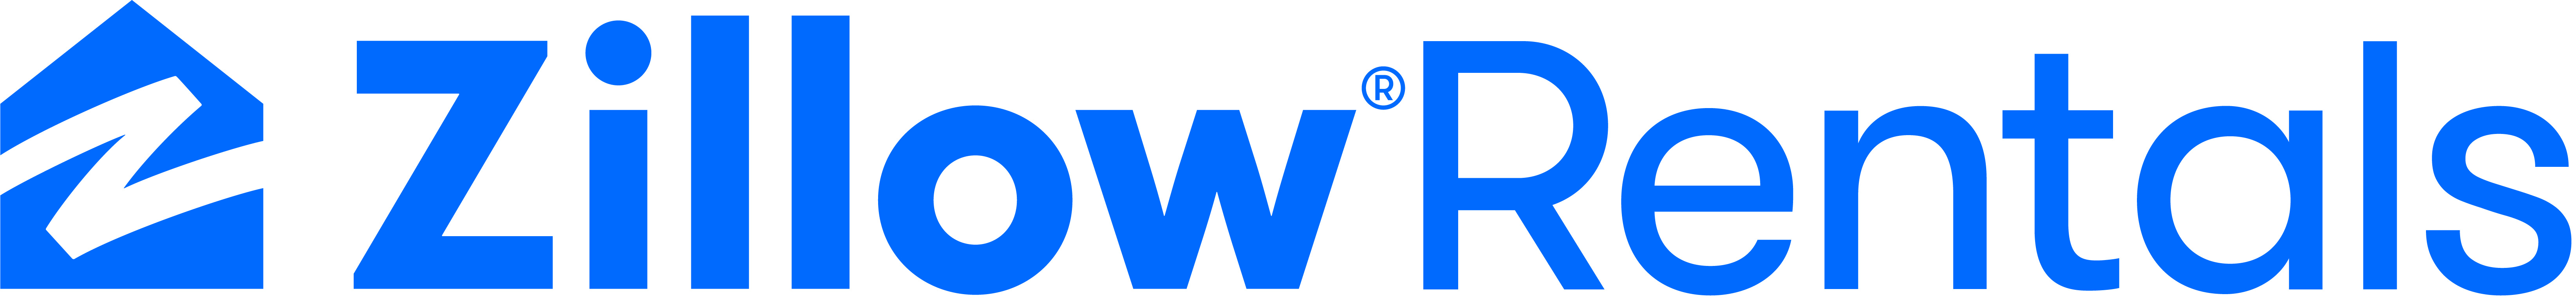 Zillow-Rentals_Horizontal_Blue_RGB